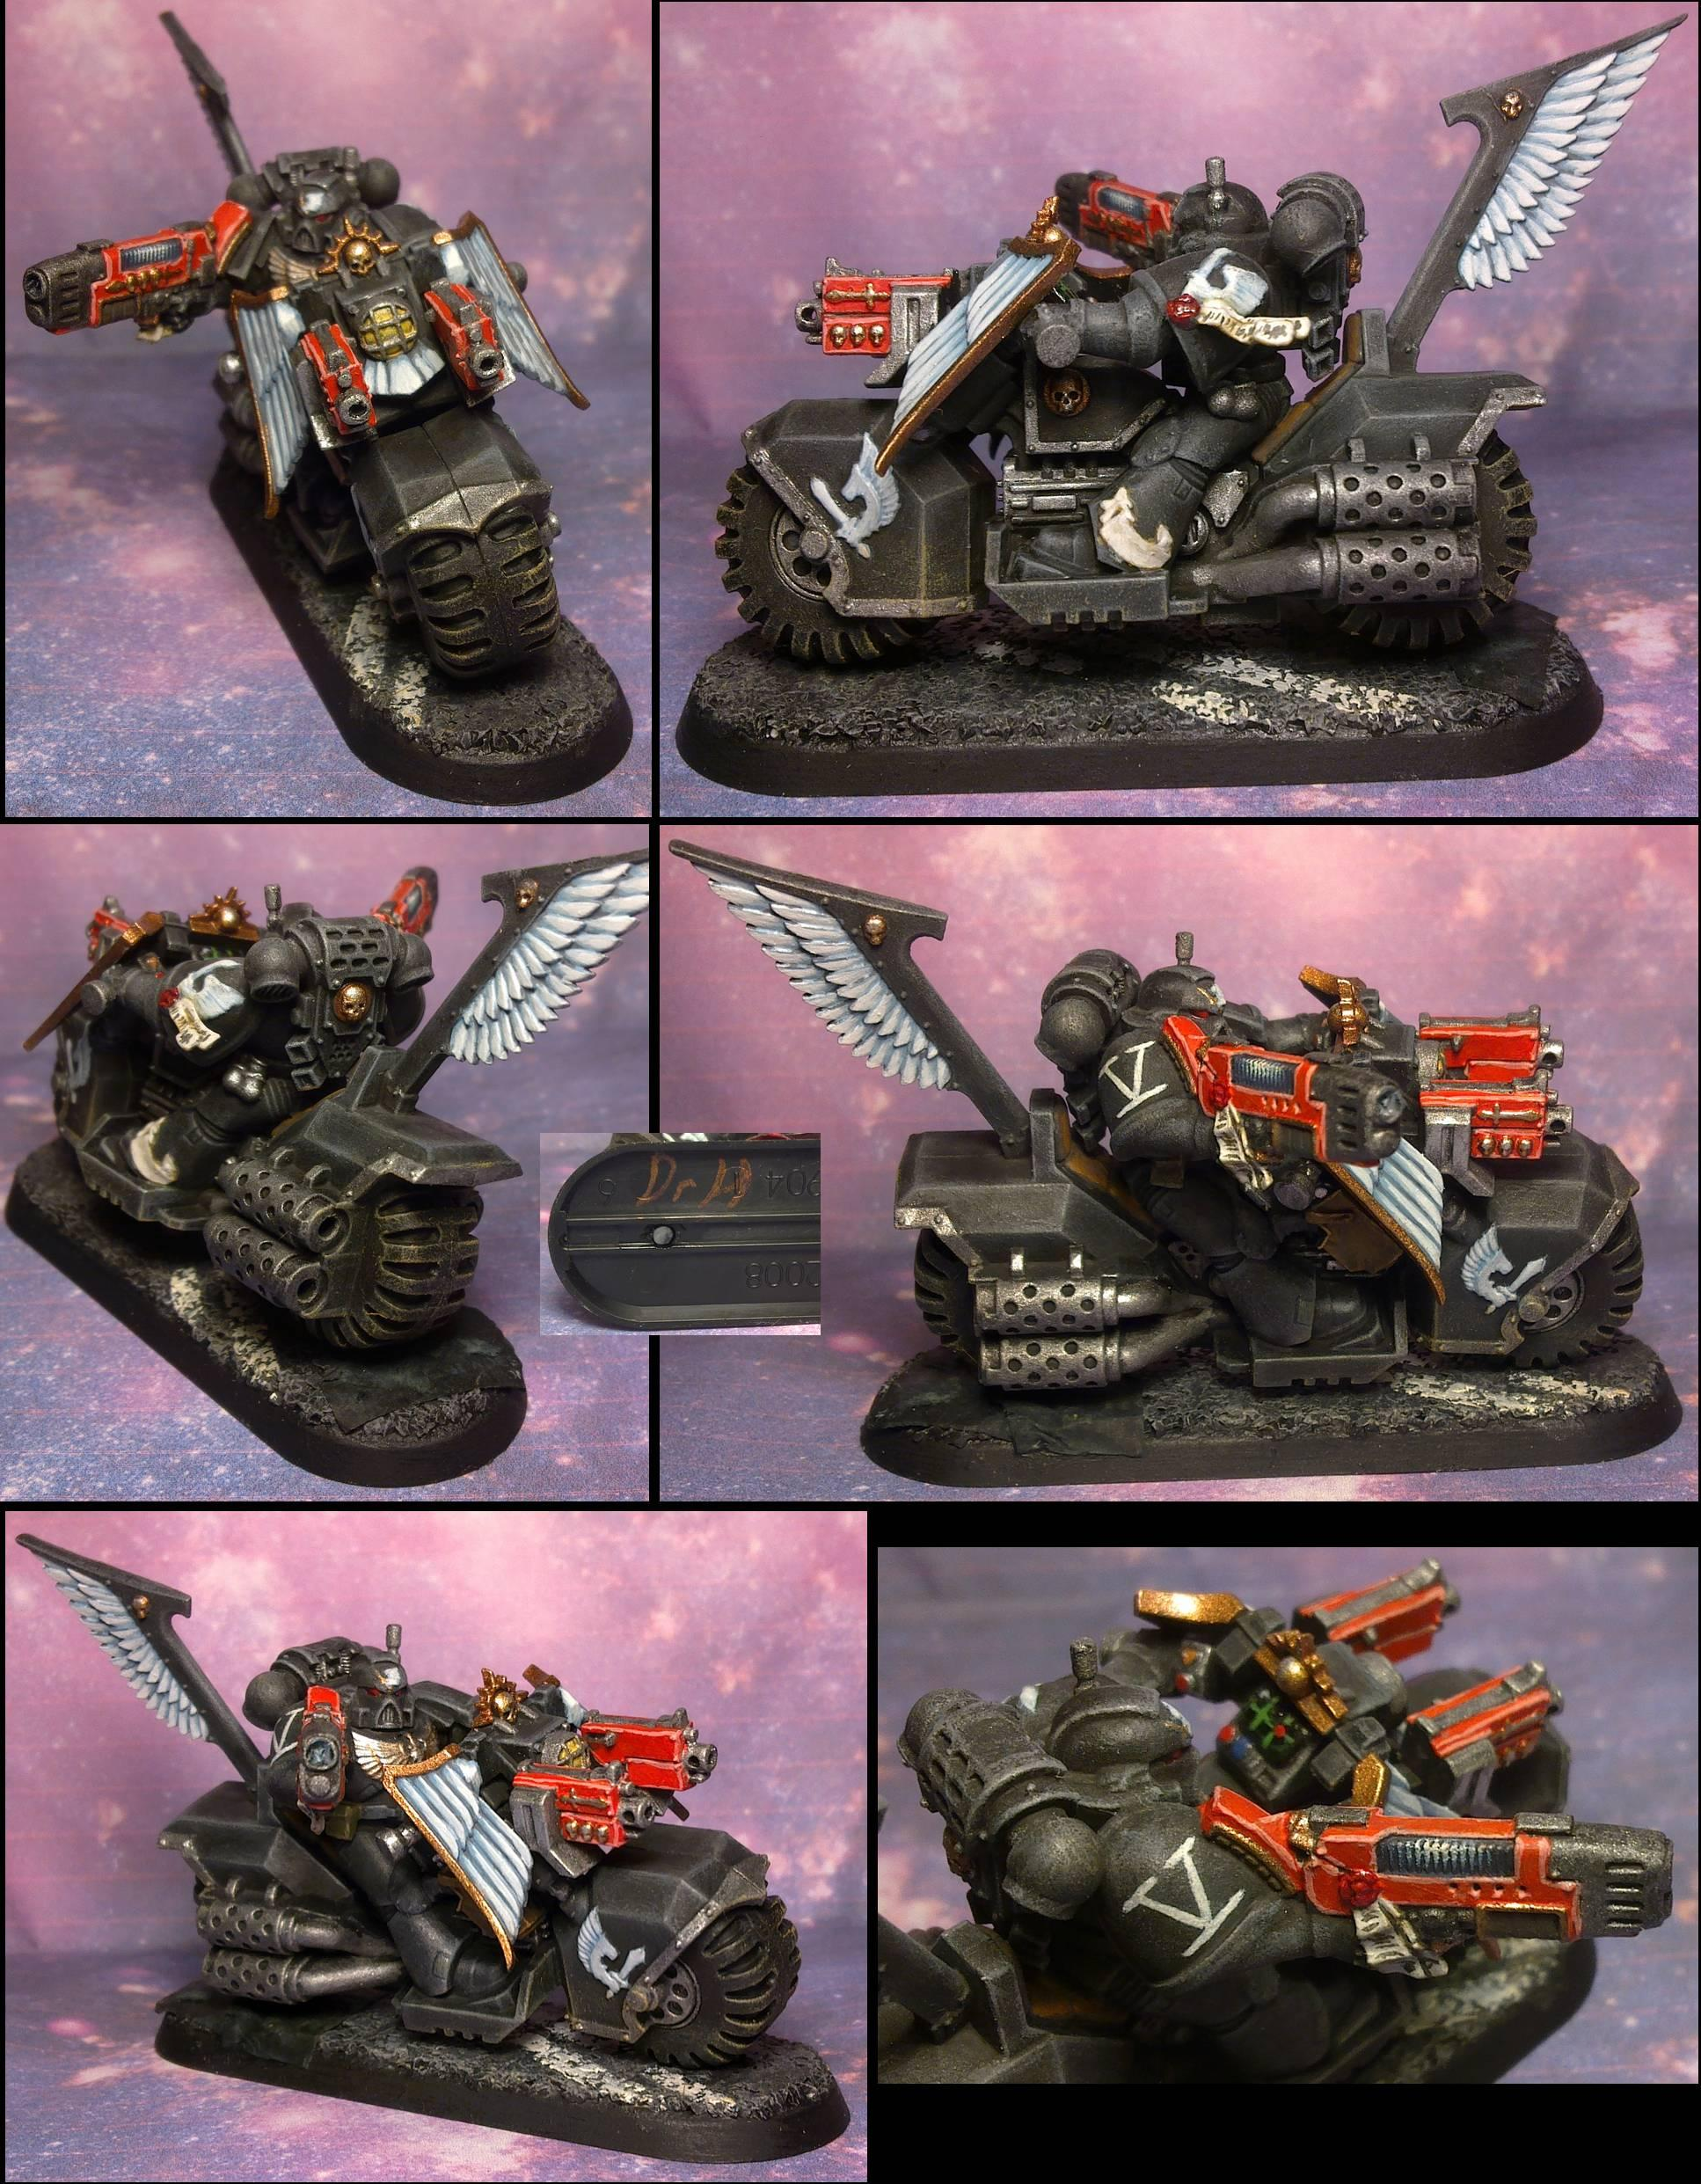 Deathwing, Dark Vengeance Ravenwing Biker 2